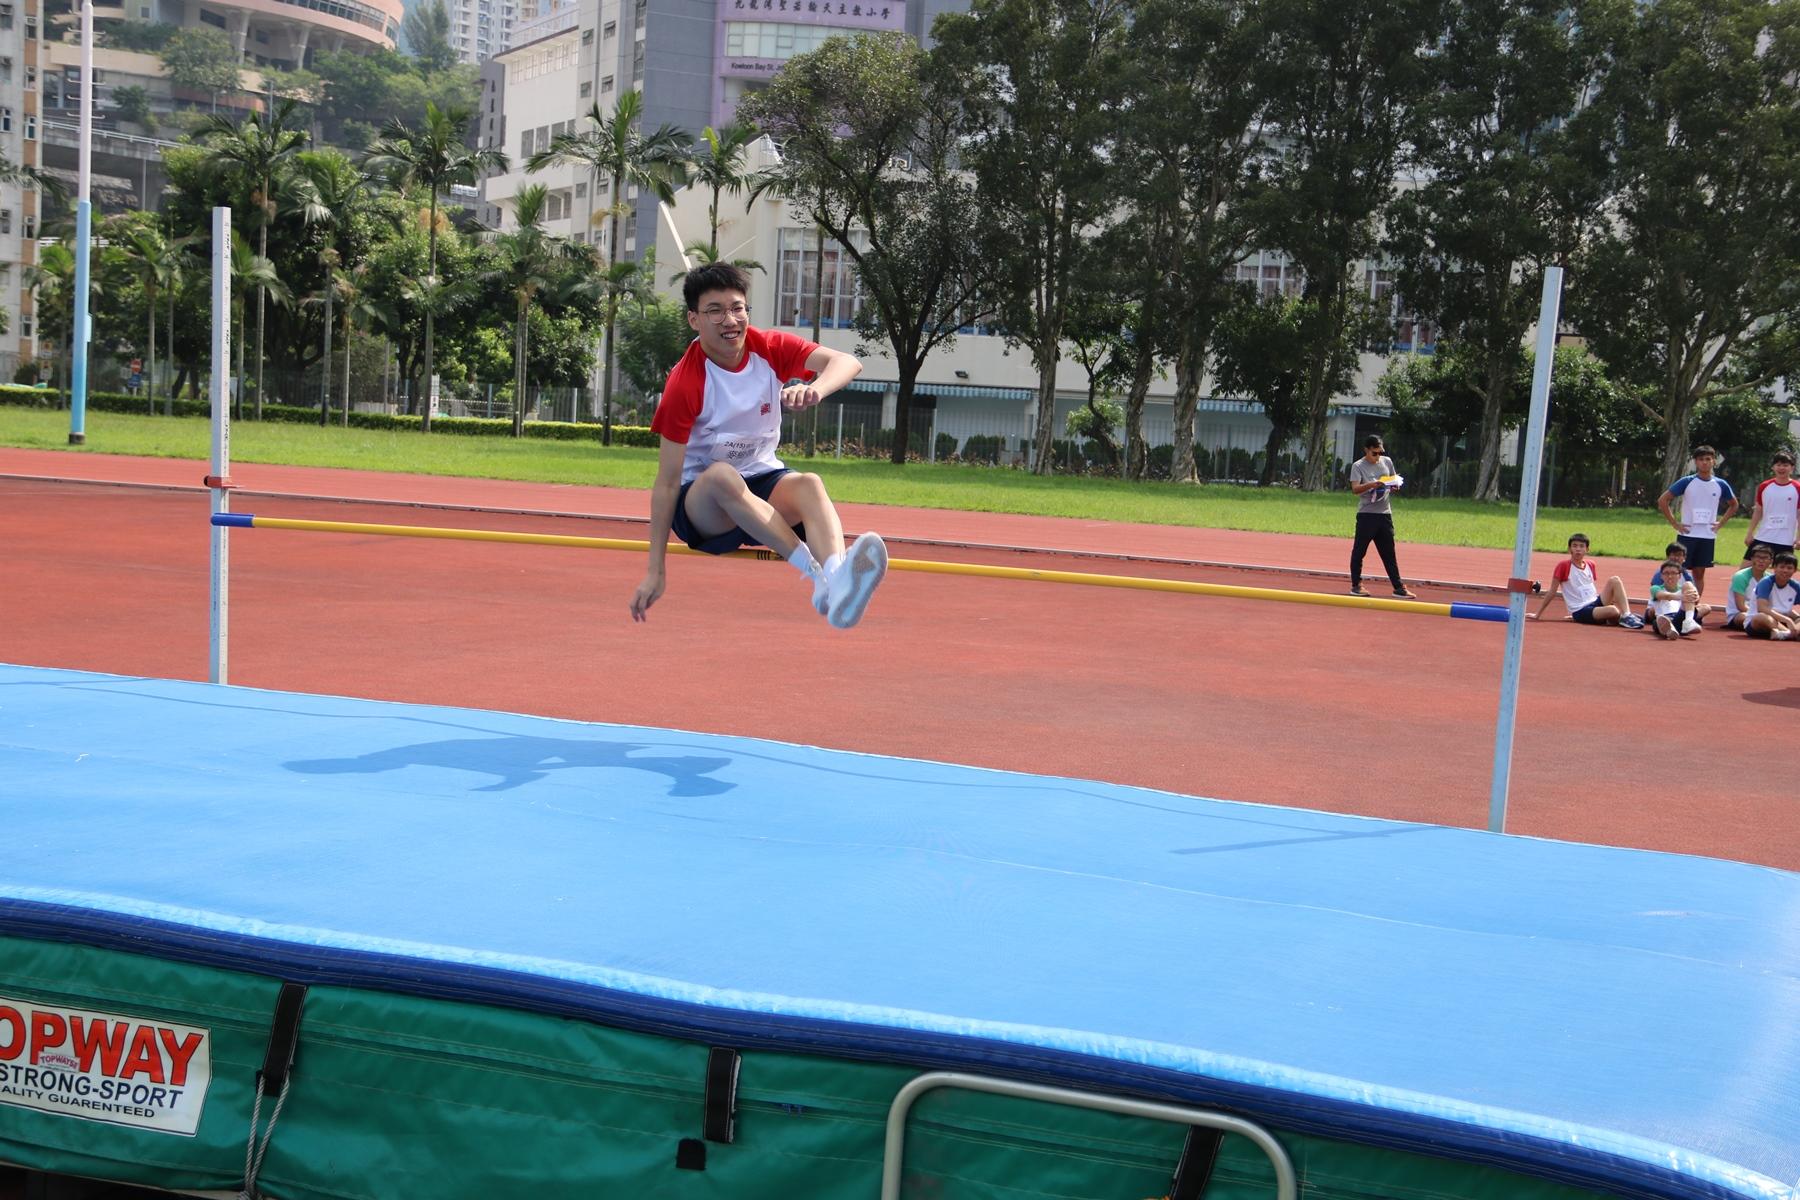 http://npc.edu.hk/sites/default/files/img_4656_1.jpg